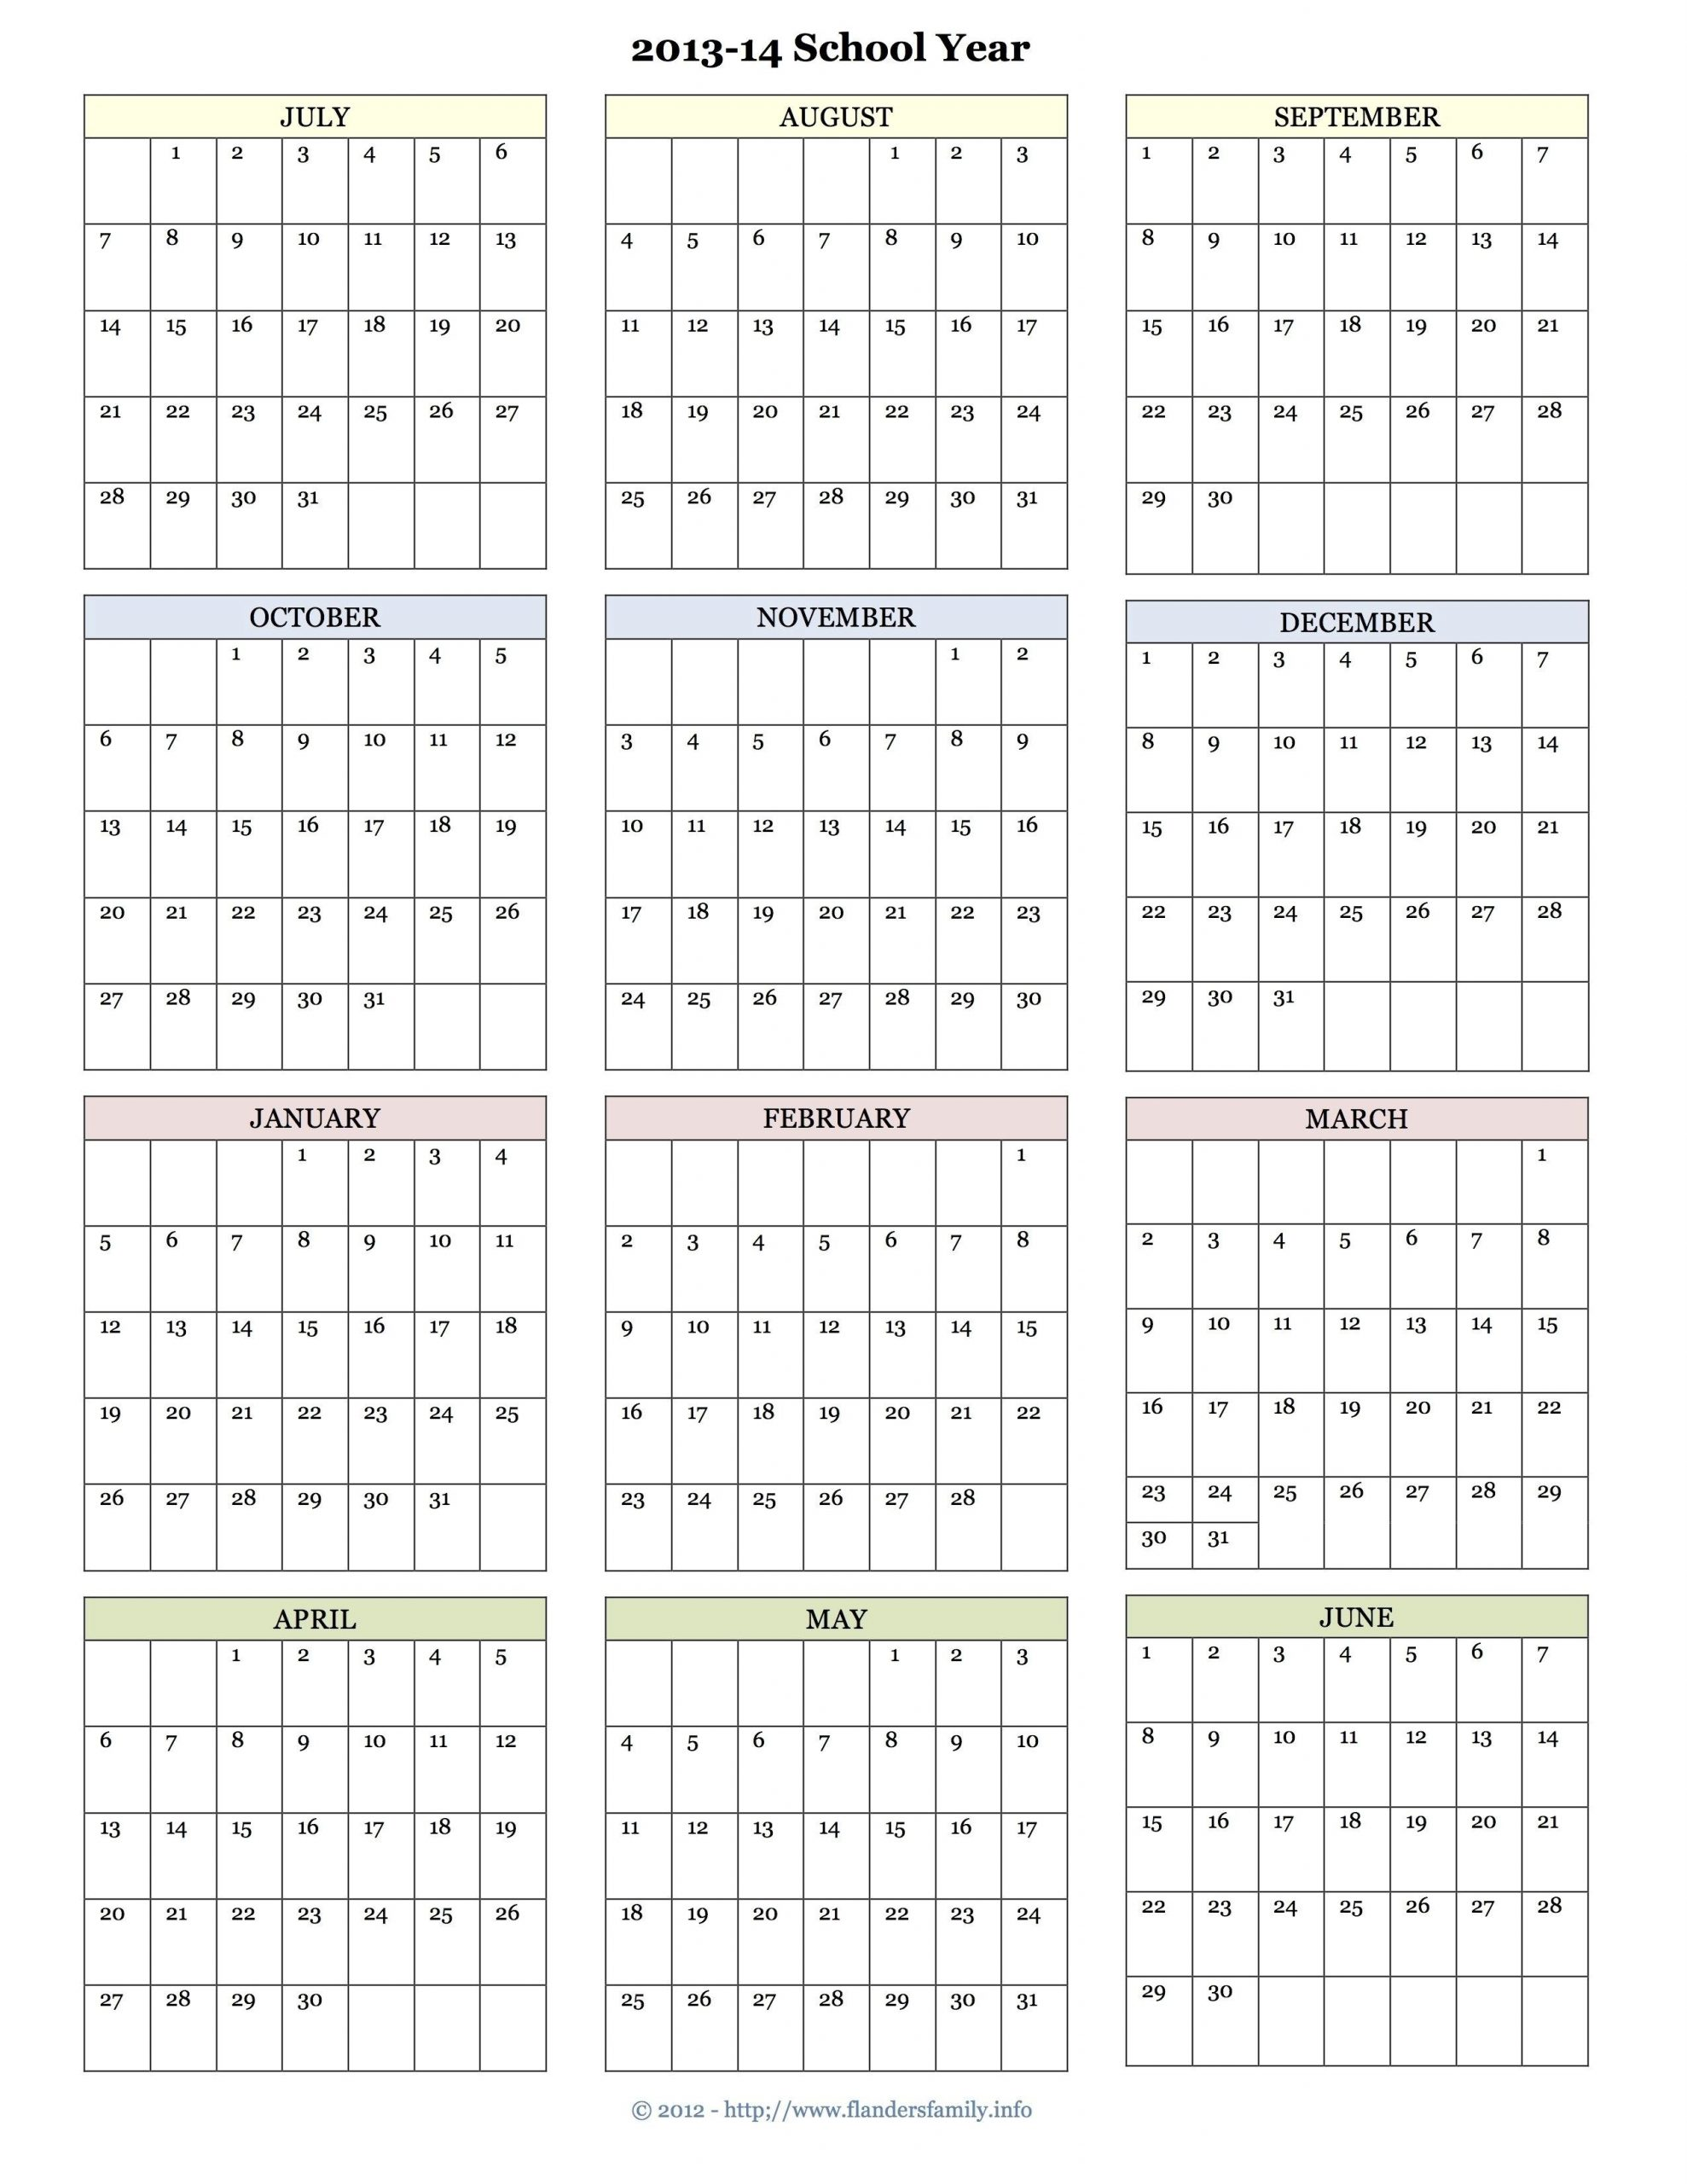 Depo Shot Calendar 2019 Depo Provera Injection Calendar 2018  Depo Provera Shot Calendar 2021